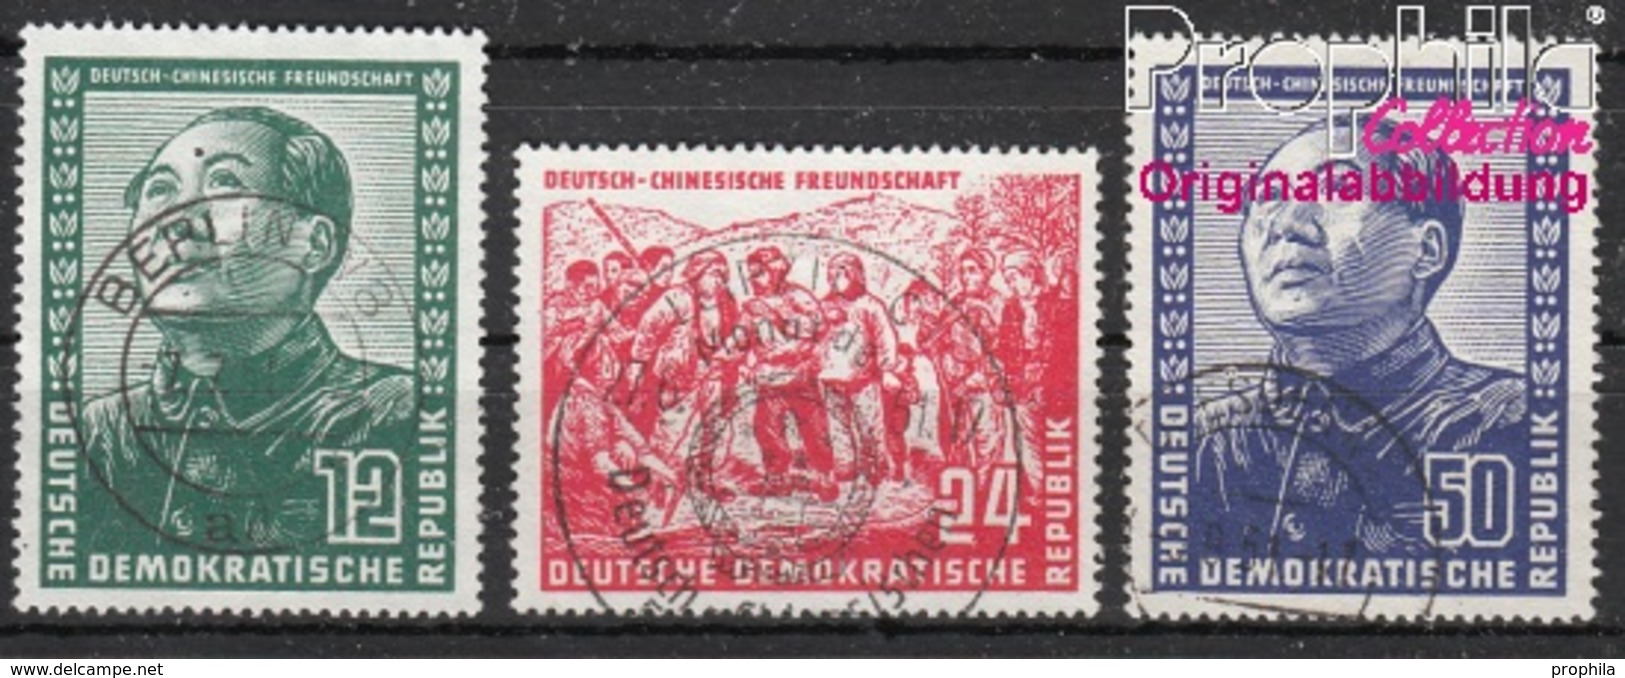 DDR 286-288 (kompl.Ausg.) Gestempelt 1951 Deutsch-chinesische Freundschaft (8844133 - DDR